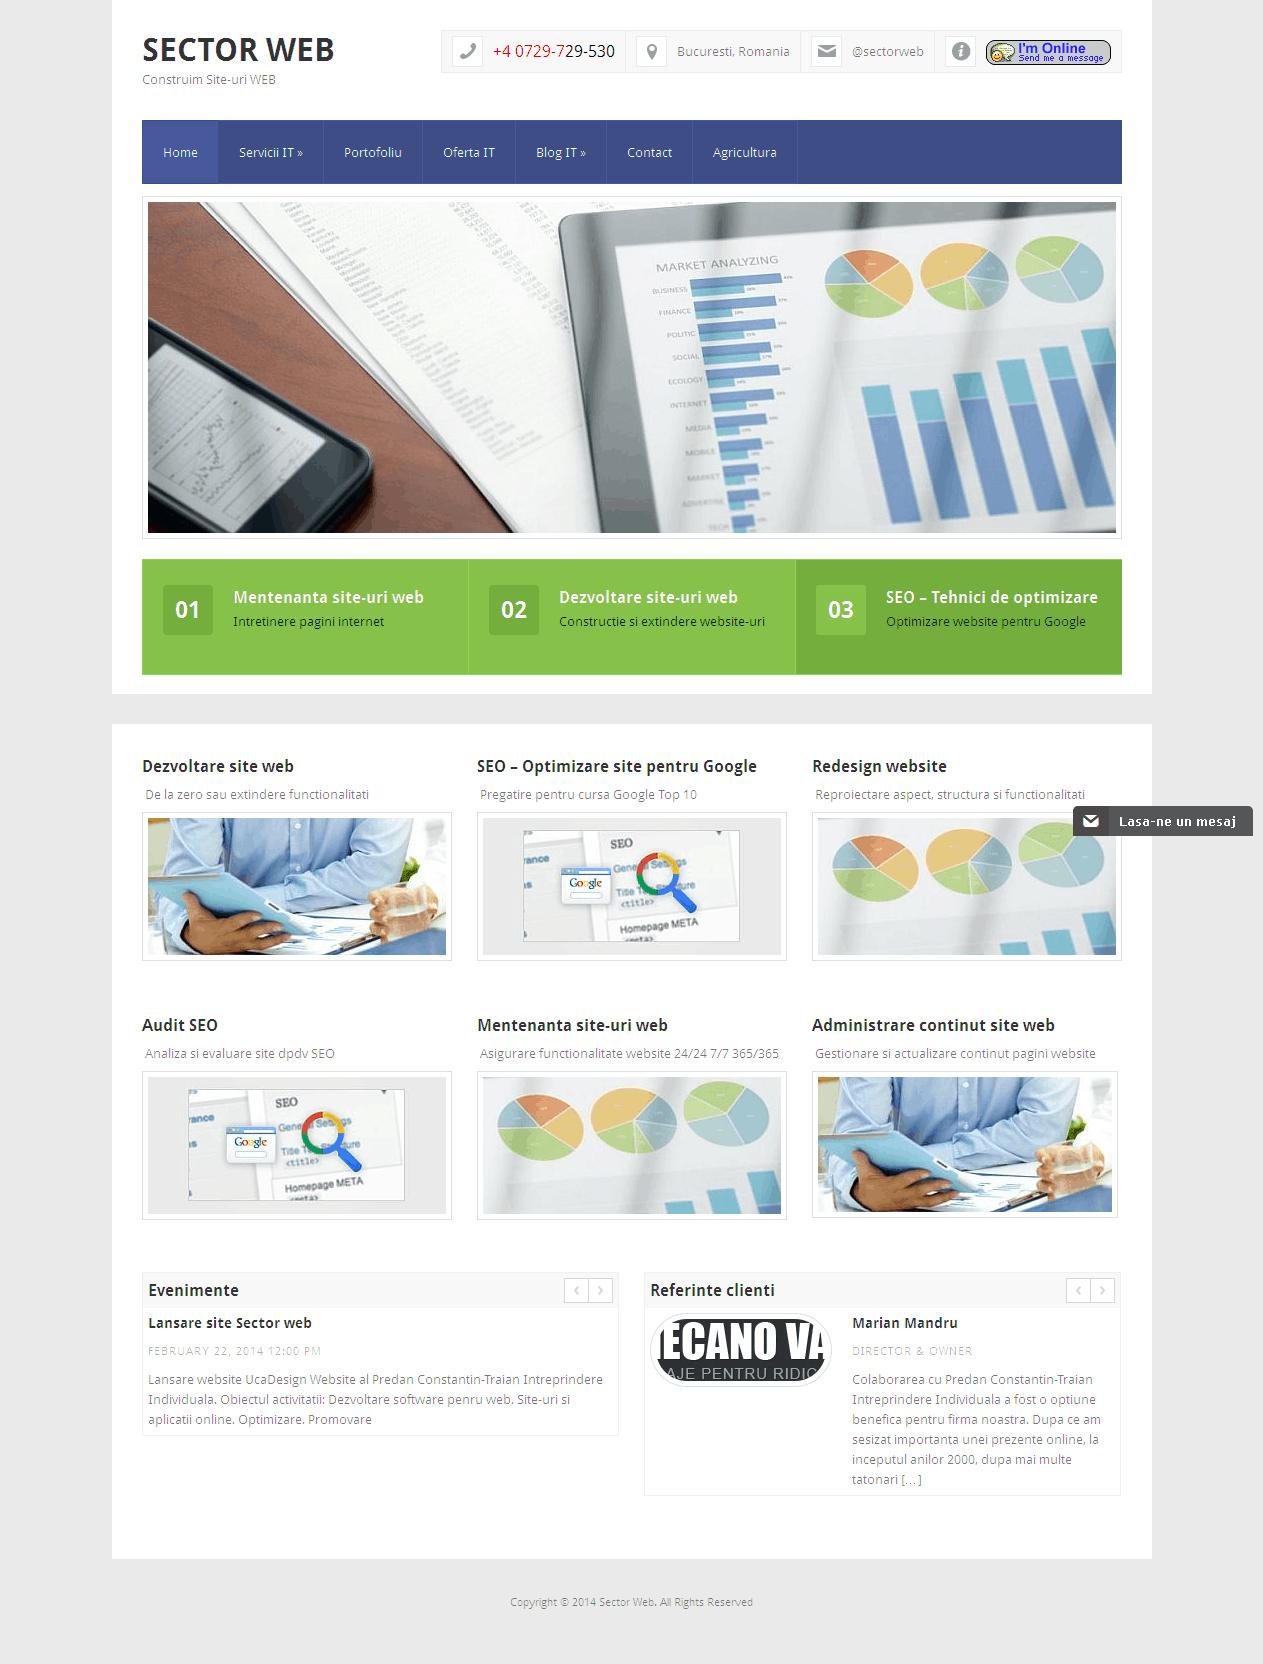 Sector Web - Construim Site-uri WEB